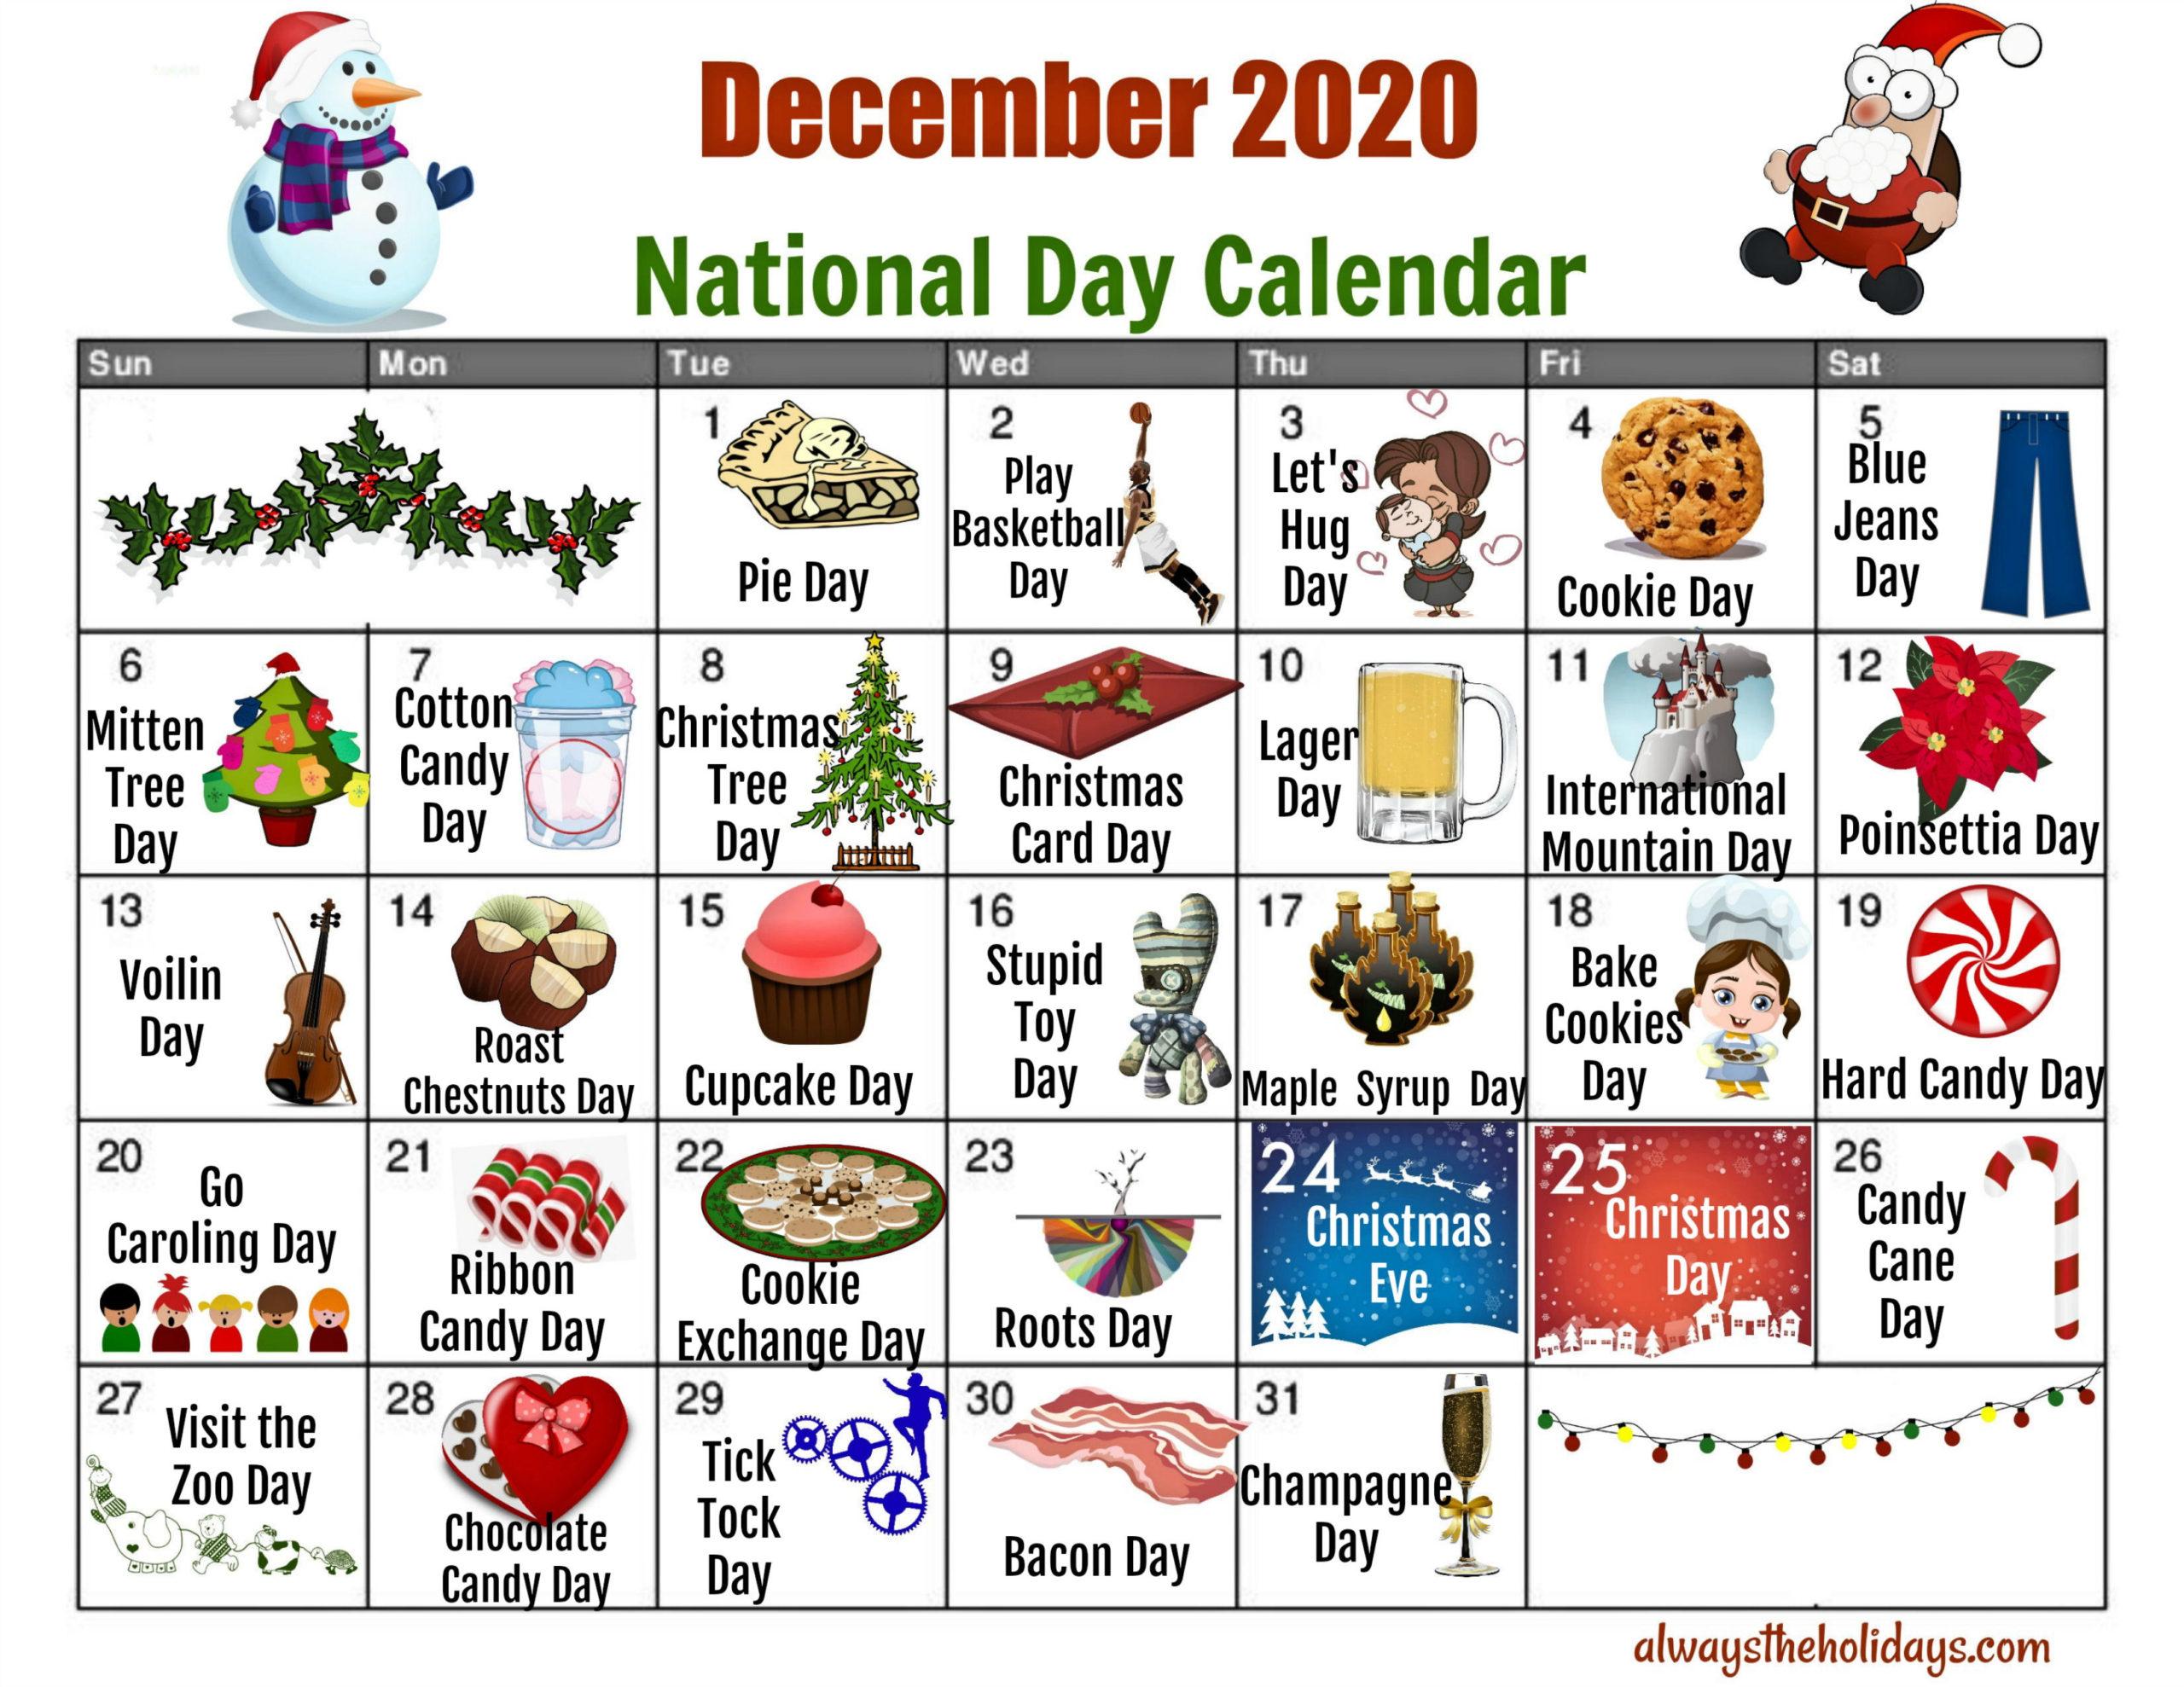 December National Day Calendar - Free Printable Calendars with Printable National Day Calendar 2021